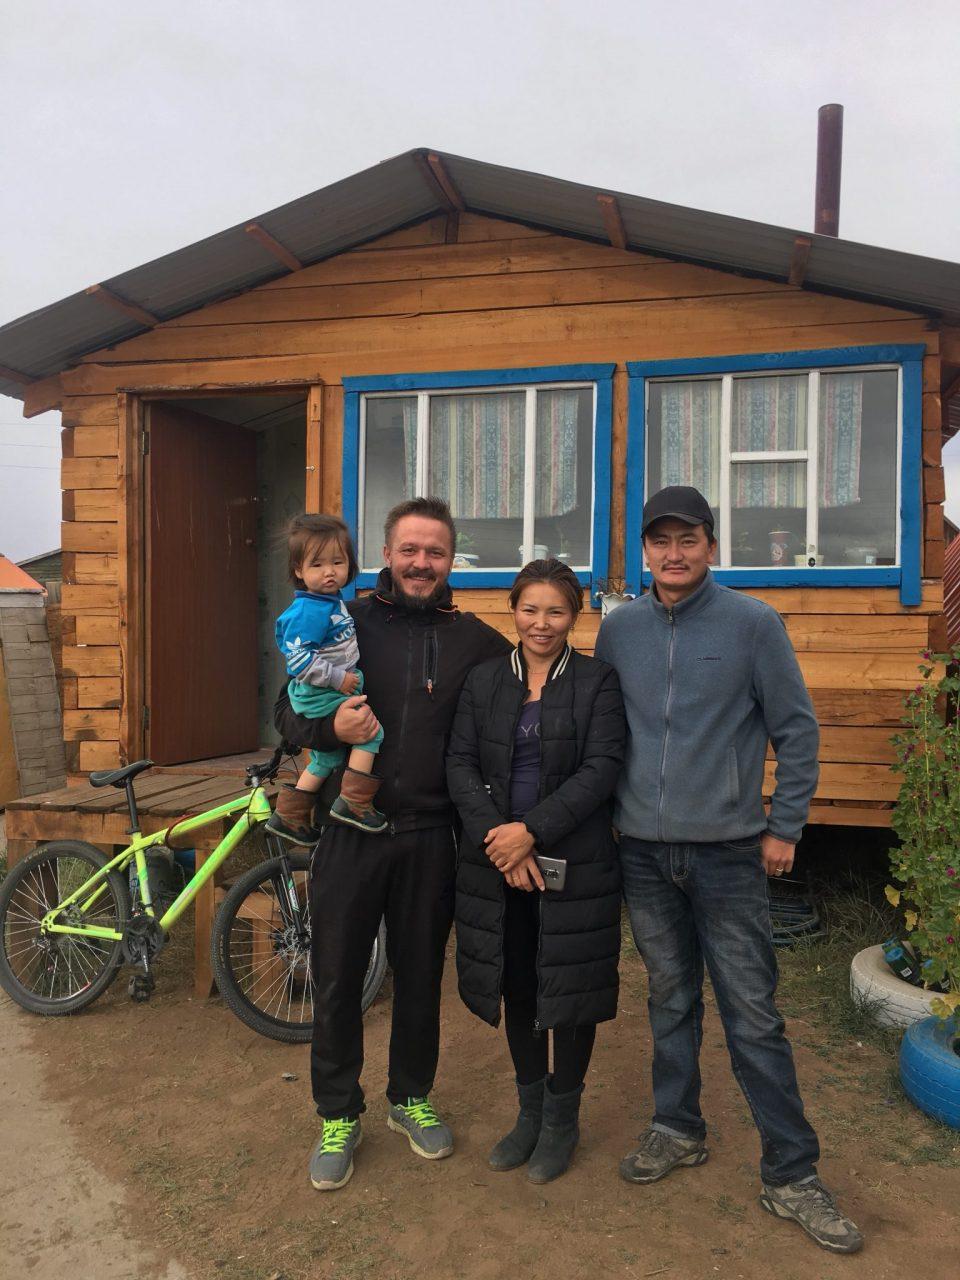 Tugsu and family